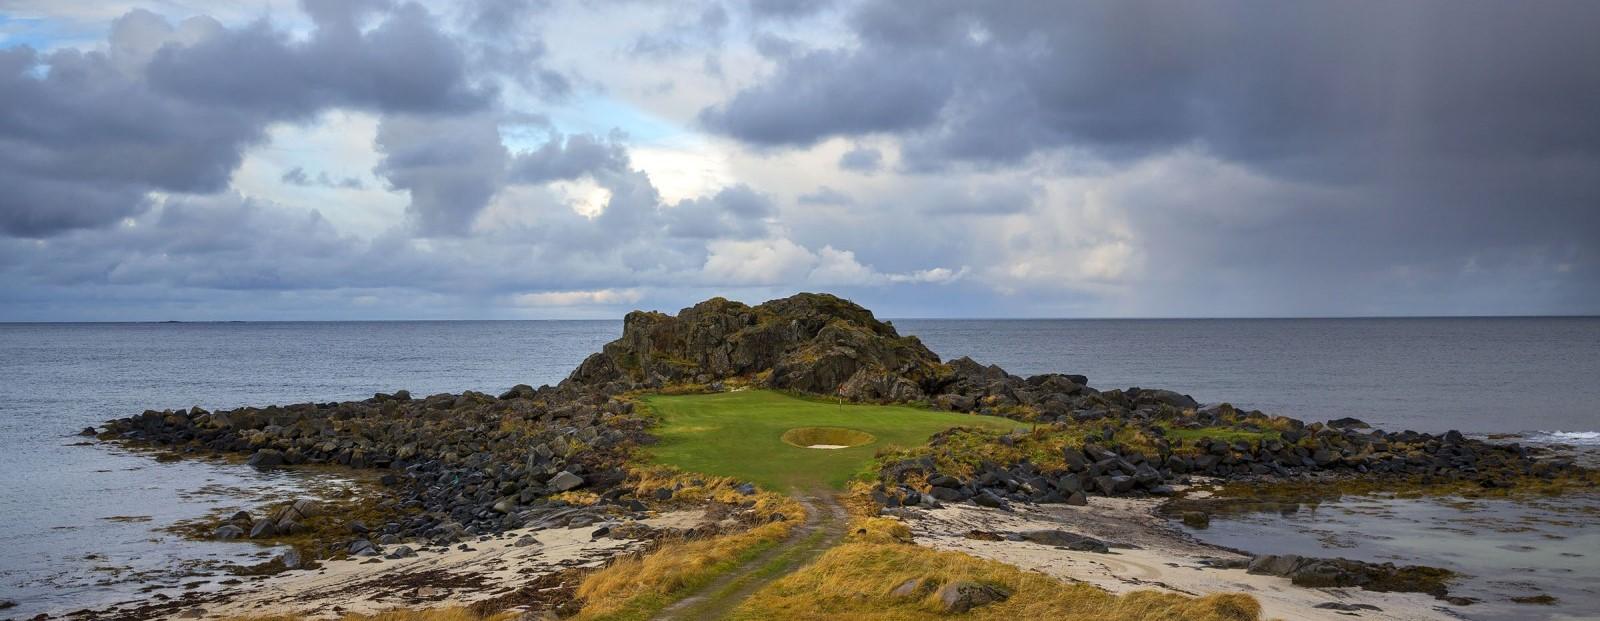 Lofoten Links Golf Course, Norway